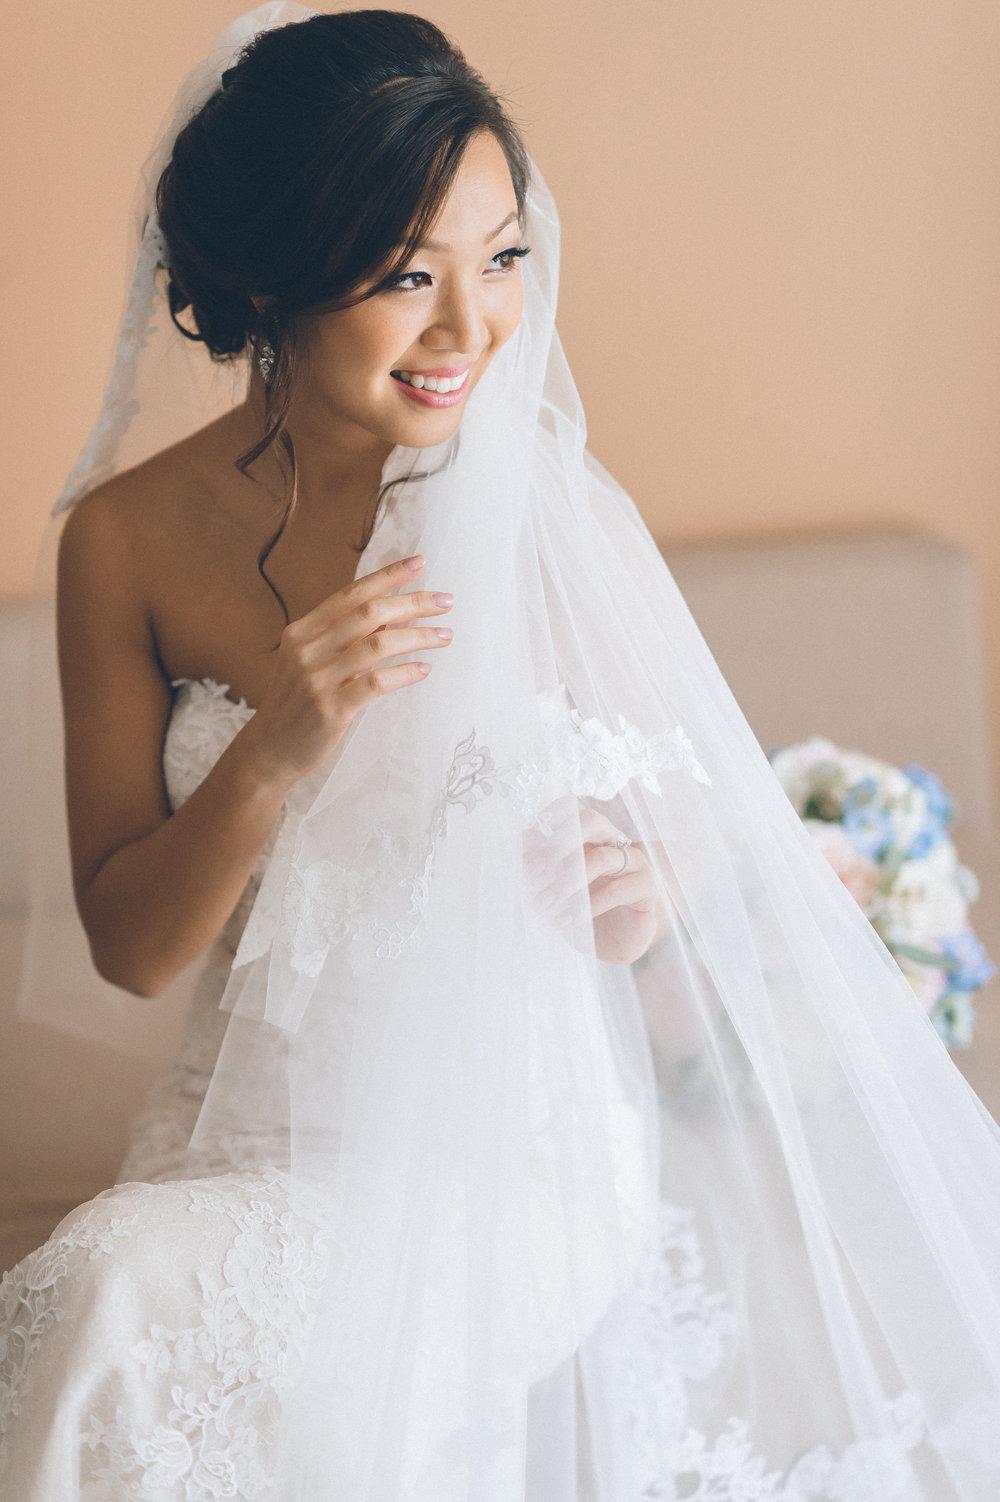 Photo by:  Ben Lau Photography   Hair & Makeup: Ashley Lugashi